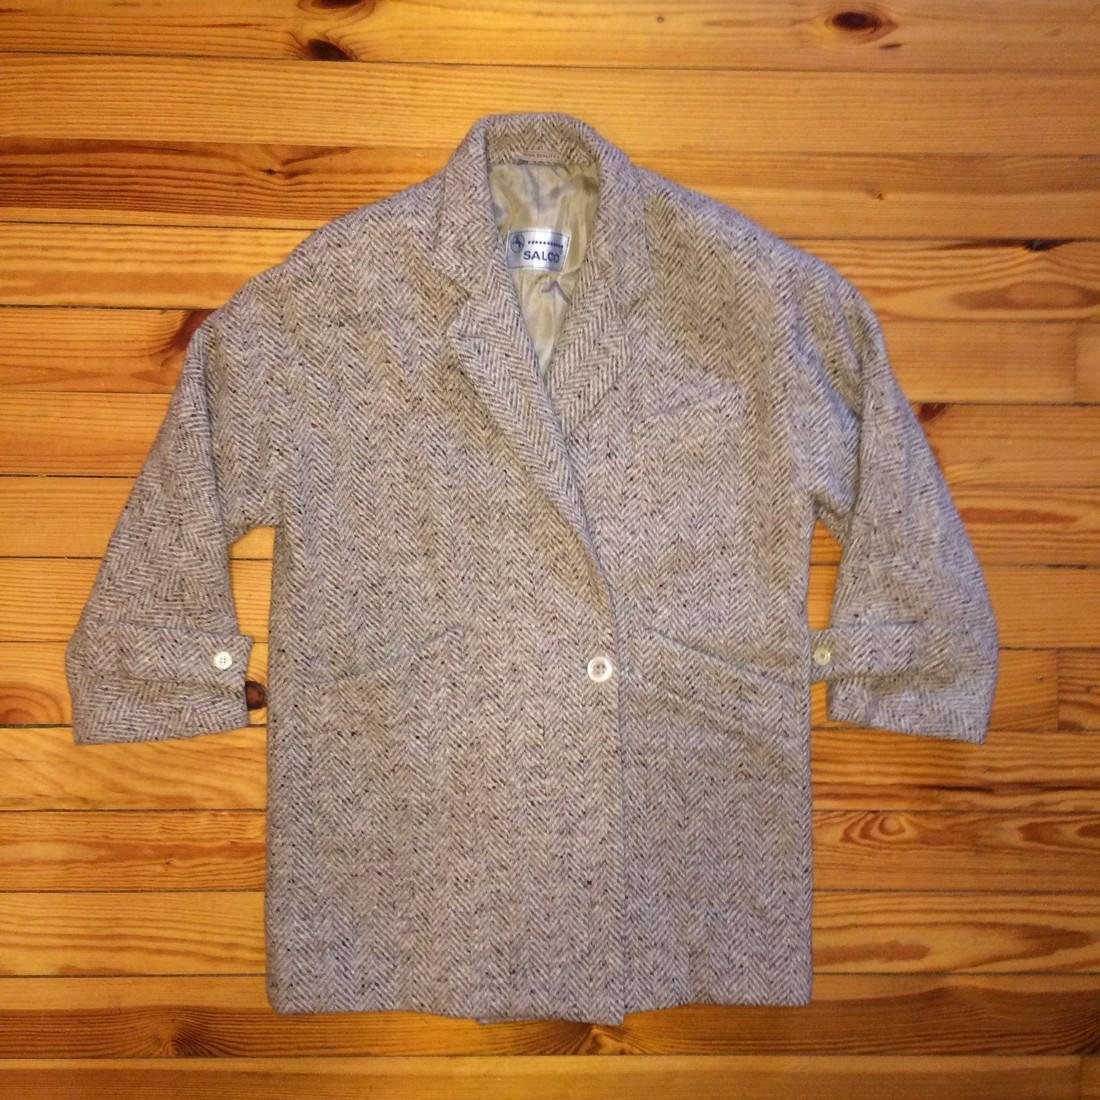 Women's Salco Pure New Wool Jacket Coat Size XL - 5